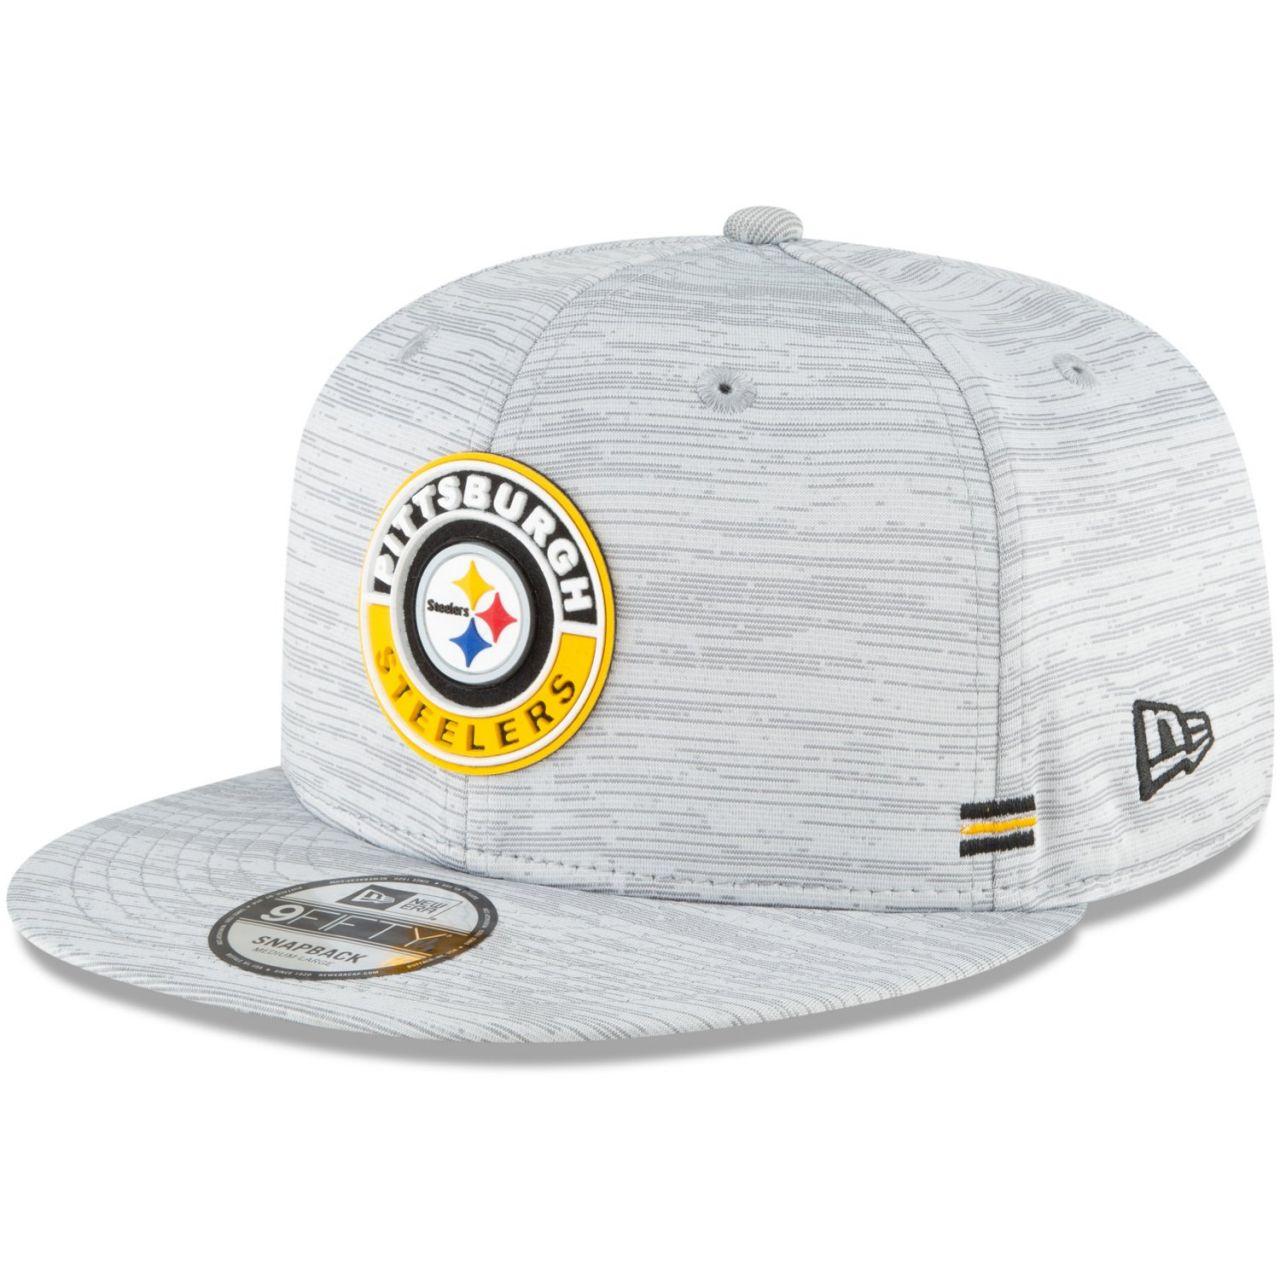 amfoo - New Era 950 Snapback Cap - SIDELINE 2020 Pittsburgh Steelers